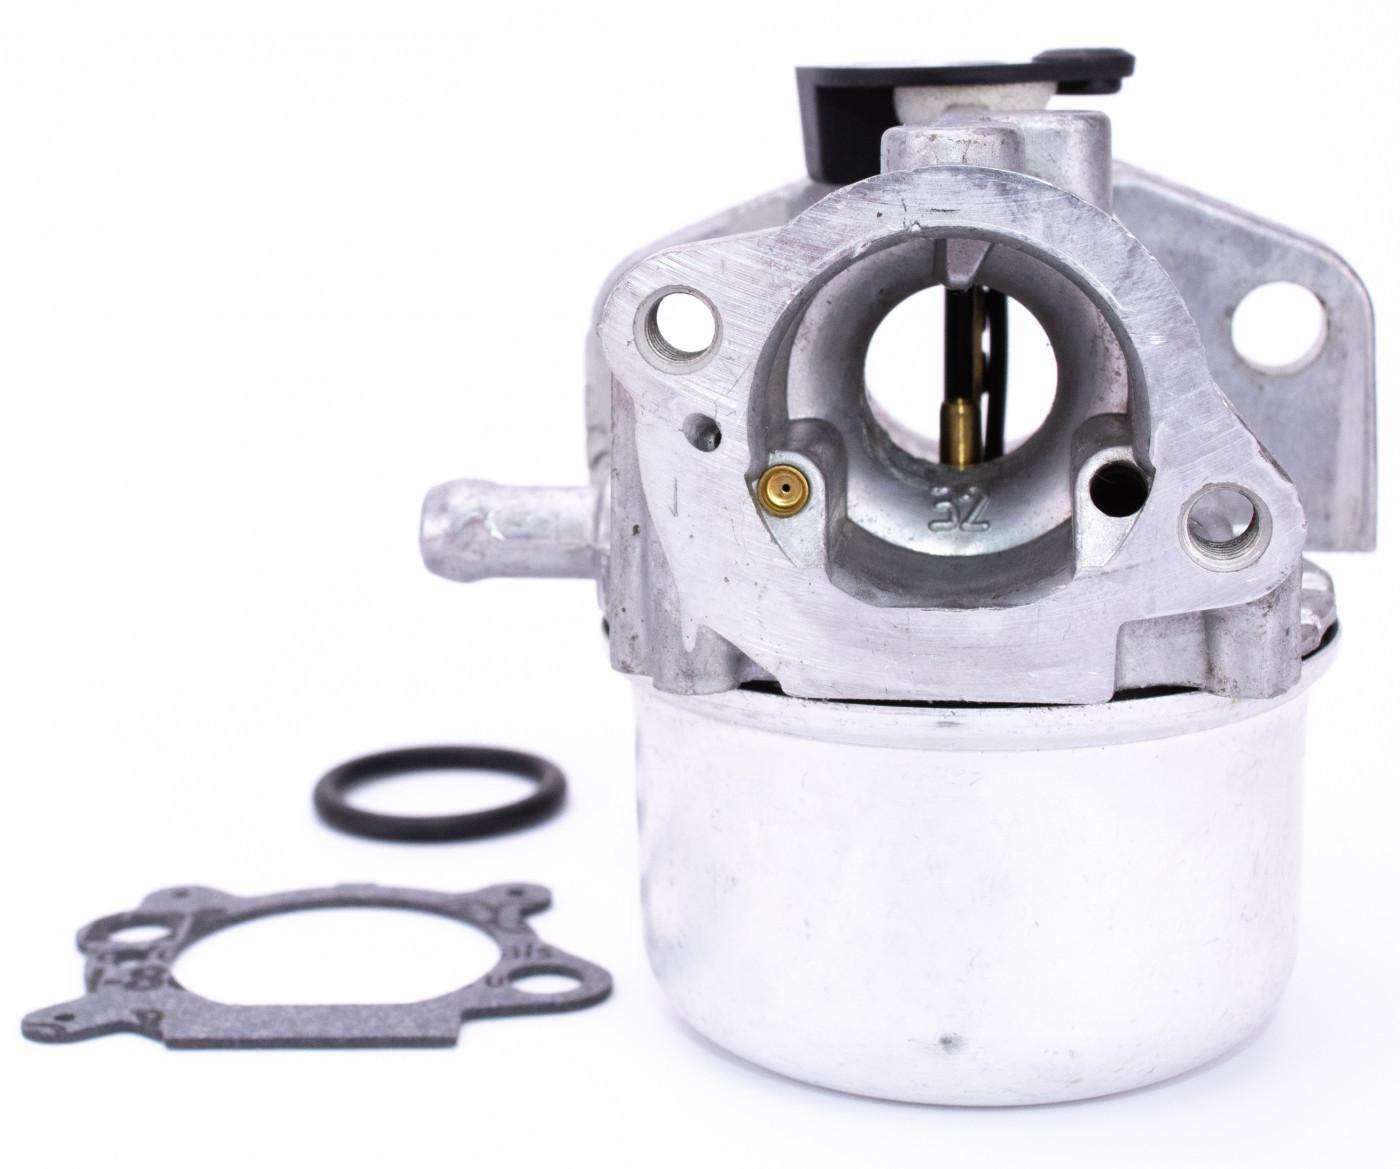 Karburátor BRIGGS&STRATTON PULSA PRIMA SERIA 600 QUANTUM Originální díl 799868